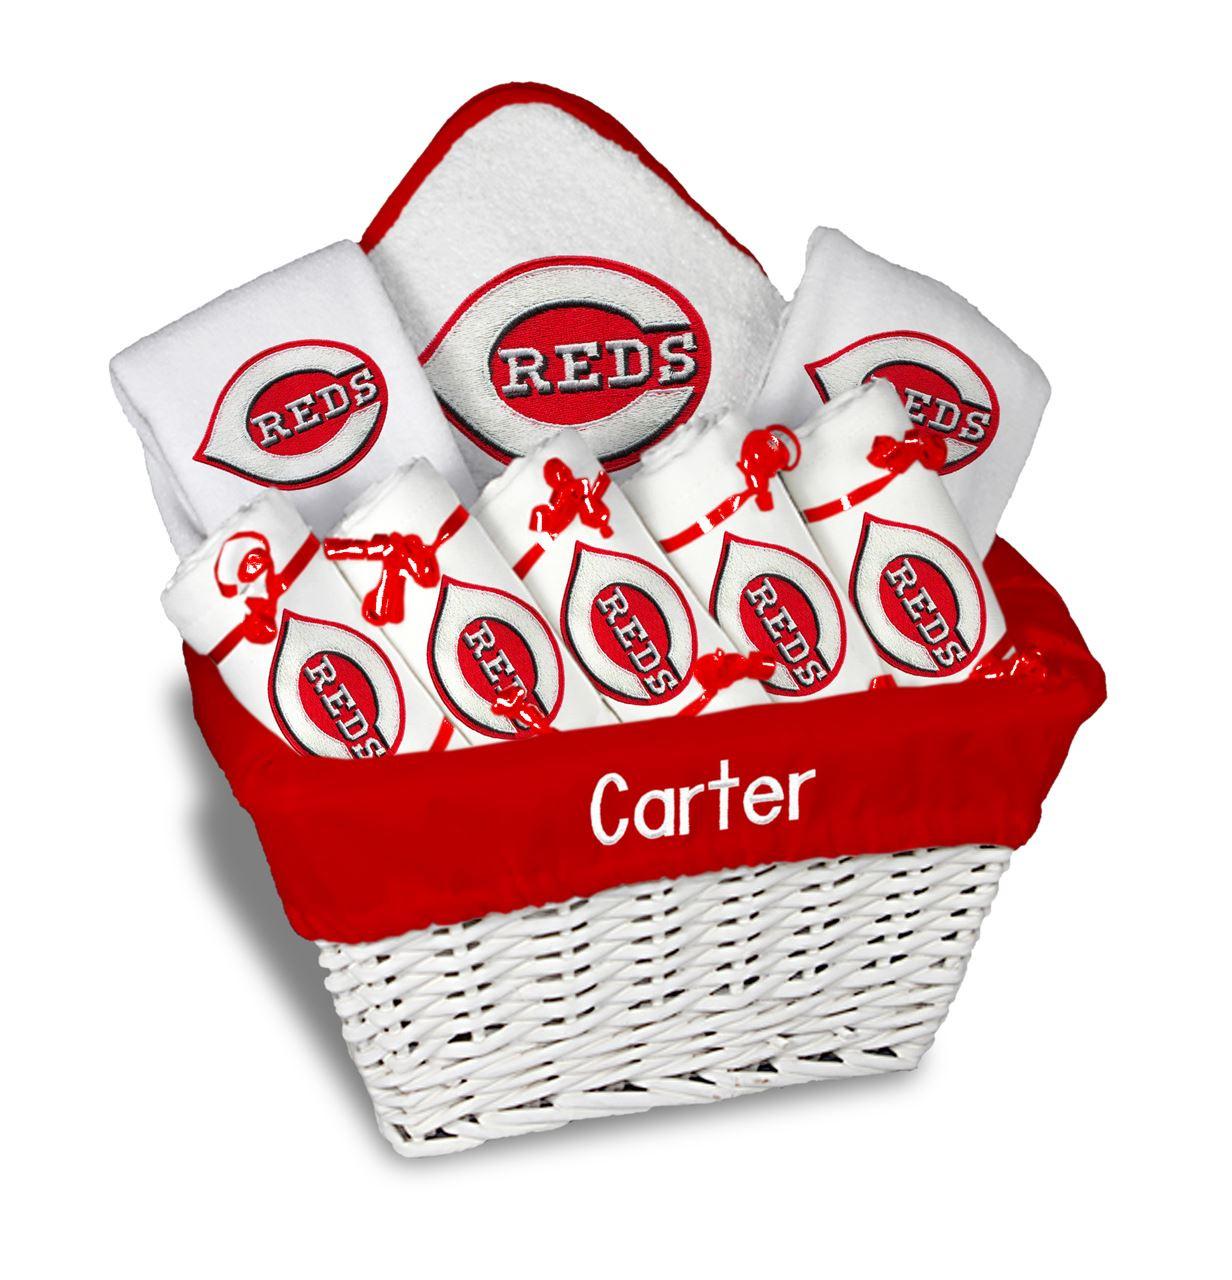 ... Cincinnati Reds Personalized 9-Piece Gift Basket. Image 1 Photo. Loading zoom  sc 1 st  Grand Slam New York & Cincinnati Reds Personalized 9-Piece Gift Basket